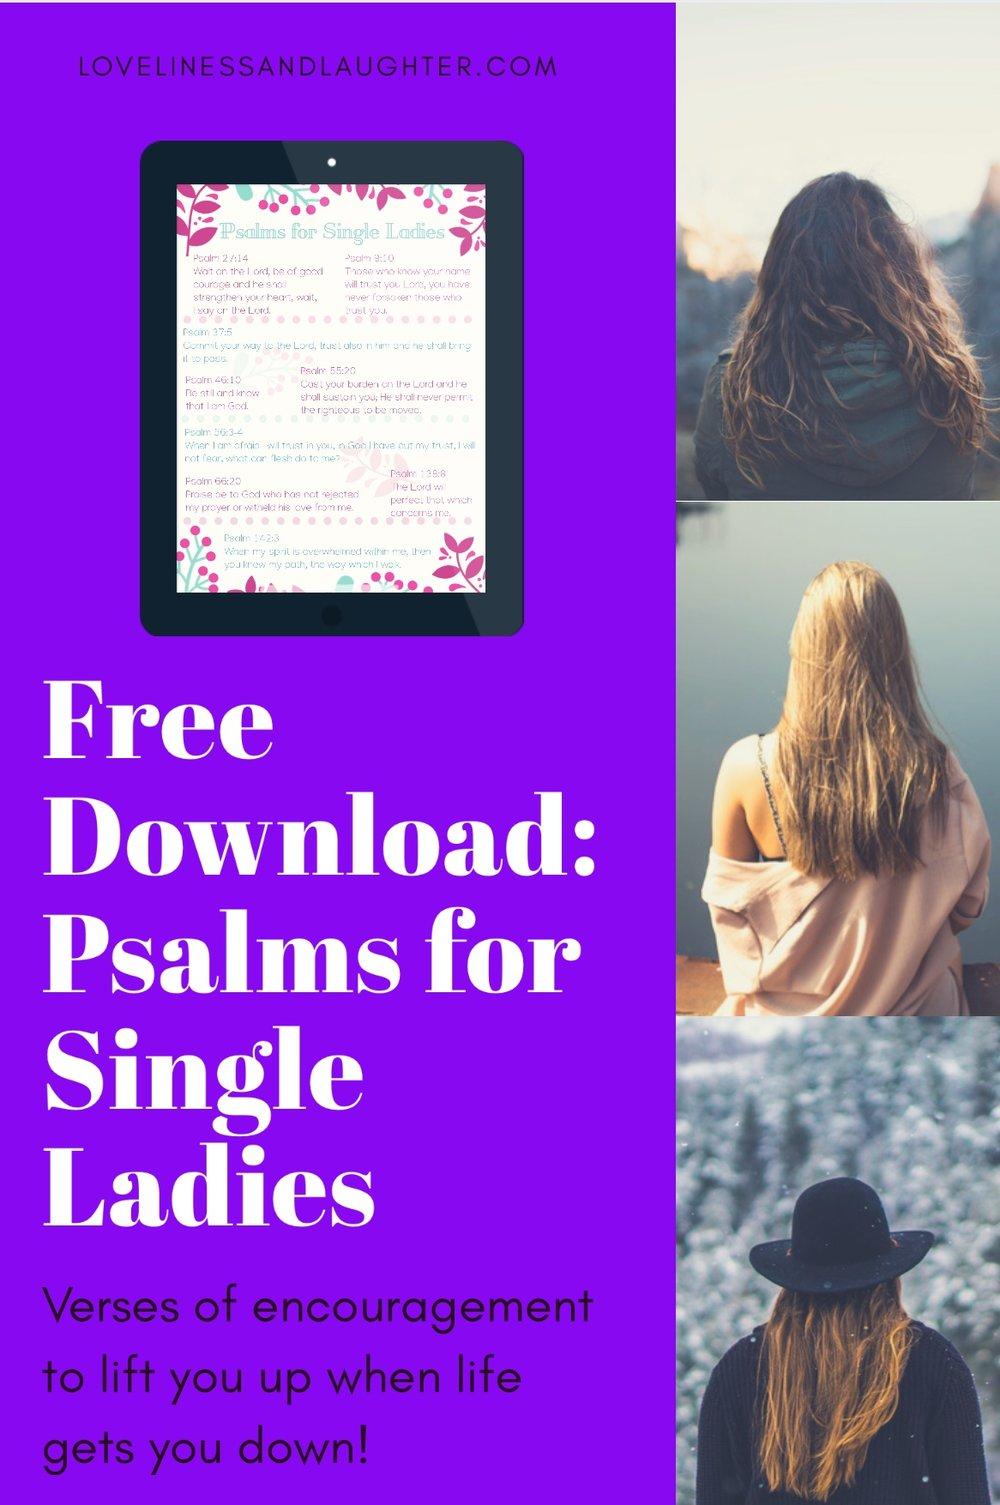 free download verses to encourage single women